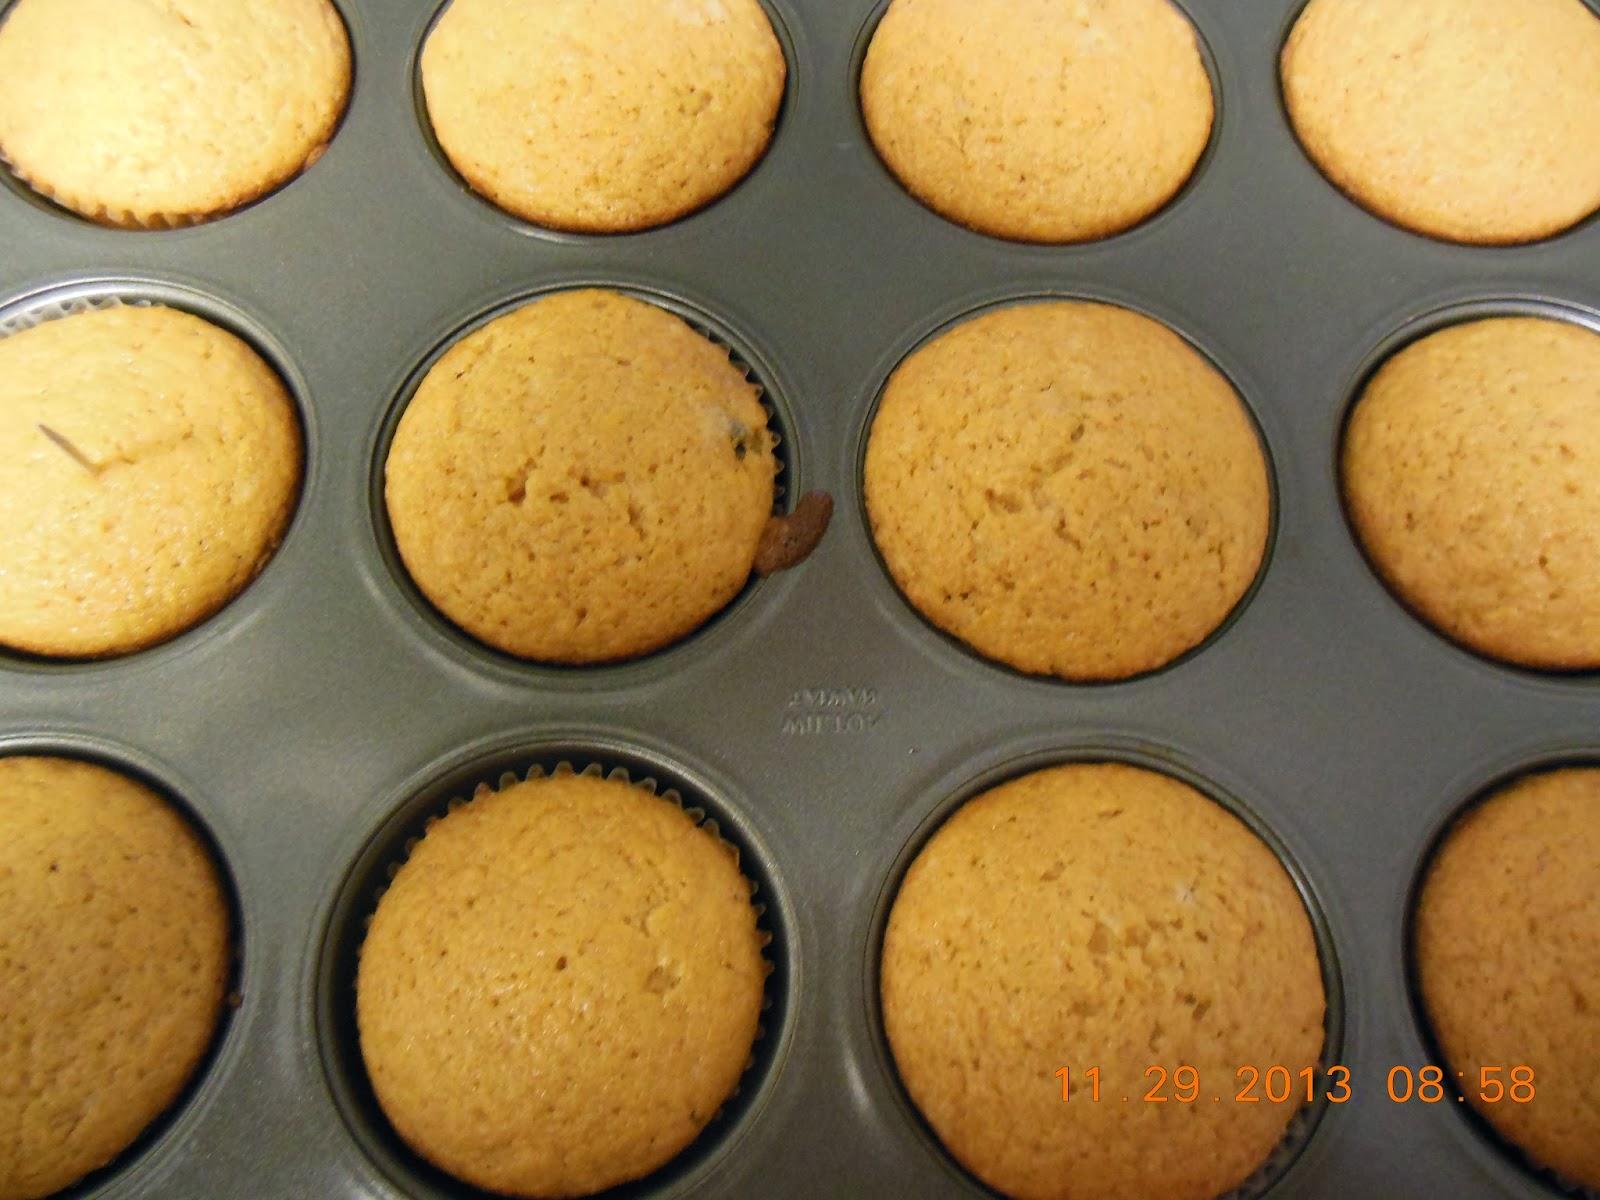 sweet potato muffins, because my husband loves muffins!